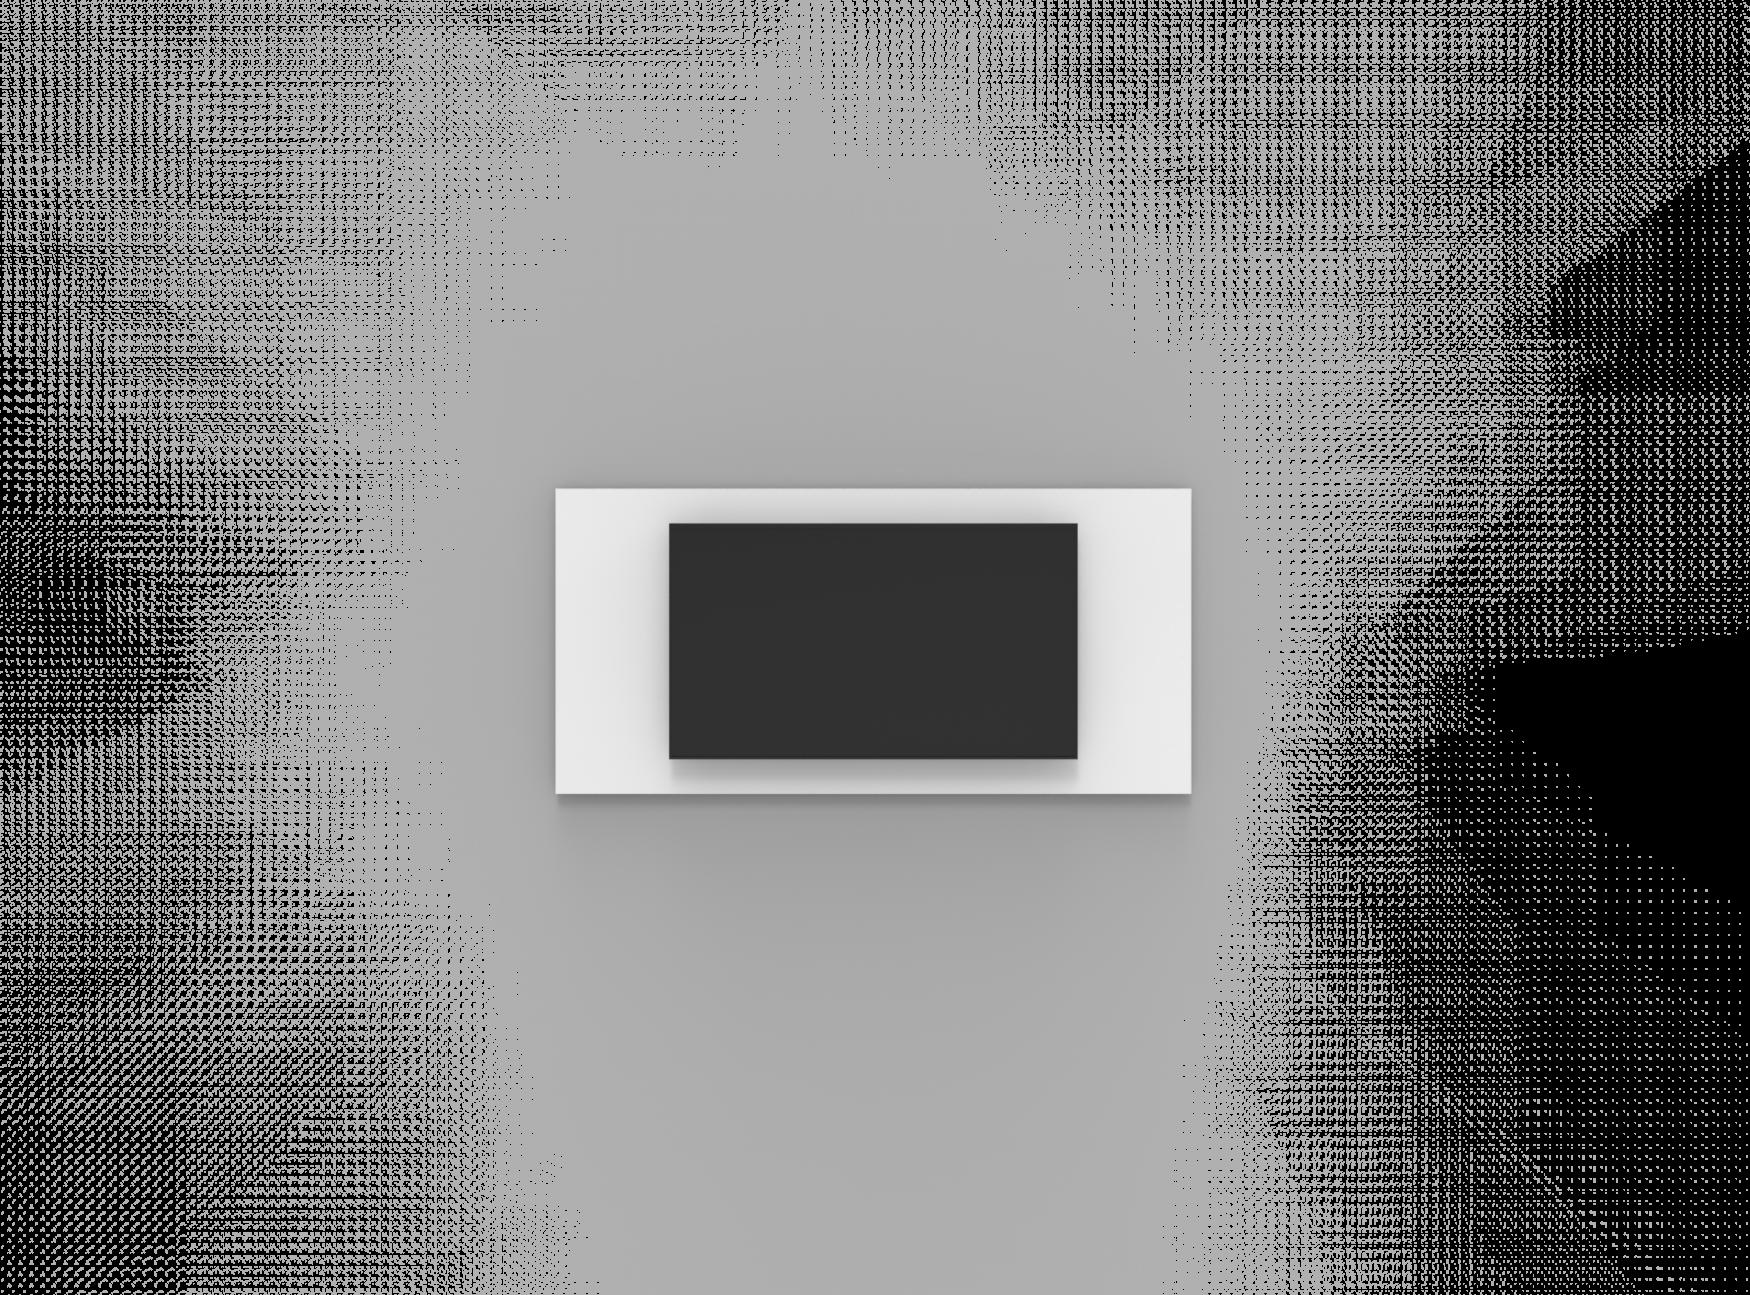 2490 x 1190